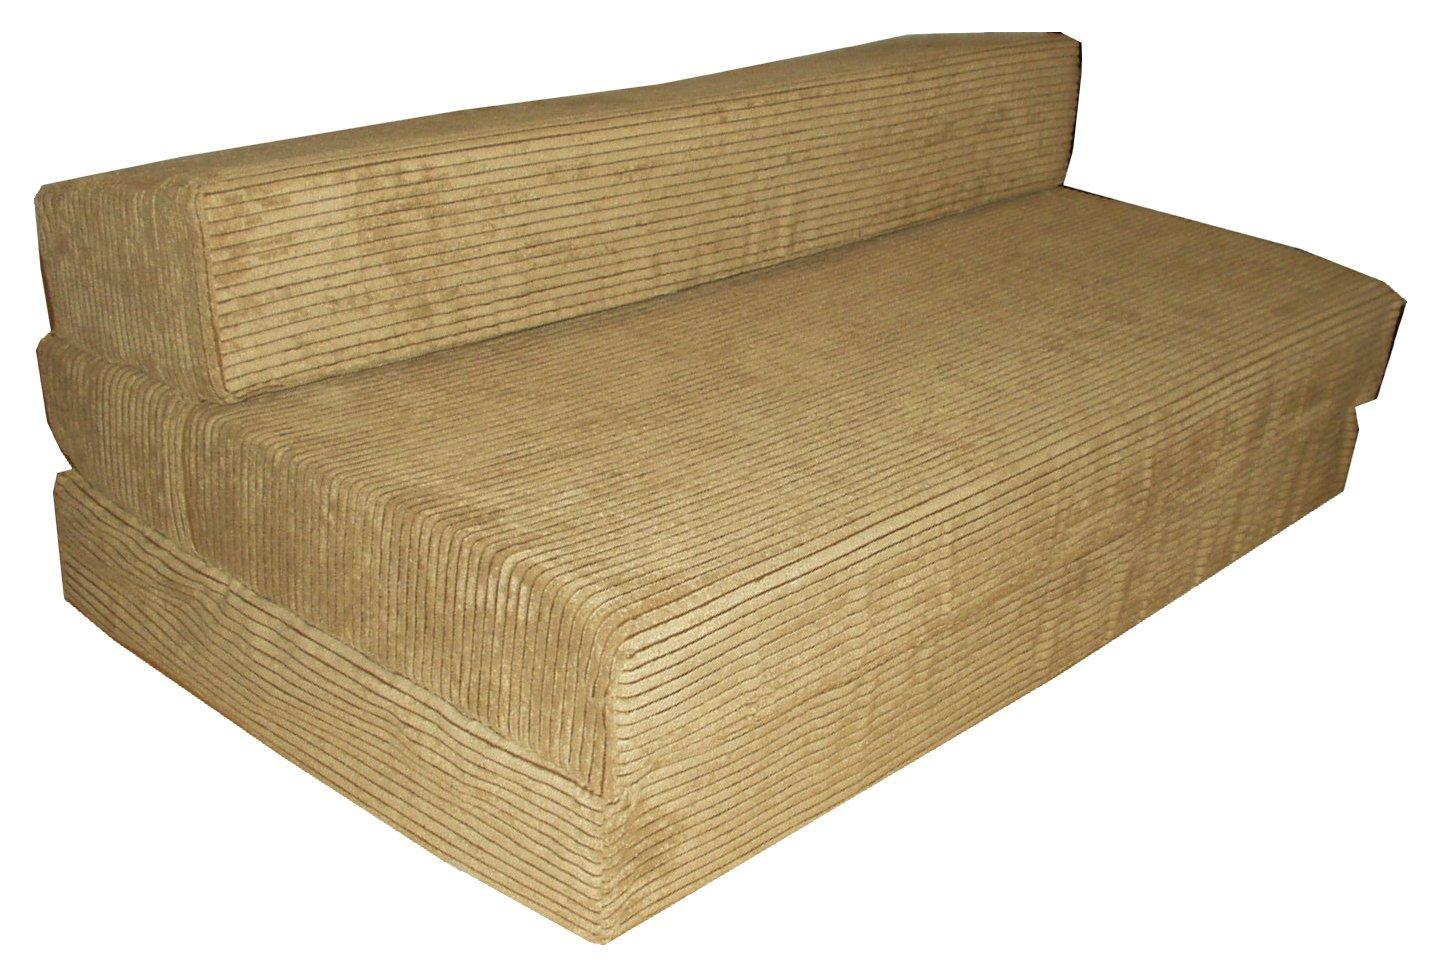 Fold Out Large Foam Guest Bed Folding Sofa Sit N Sleep Futon Seat